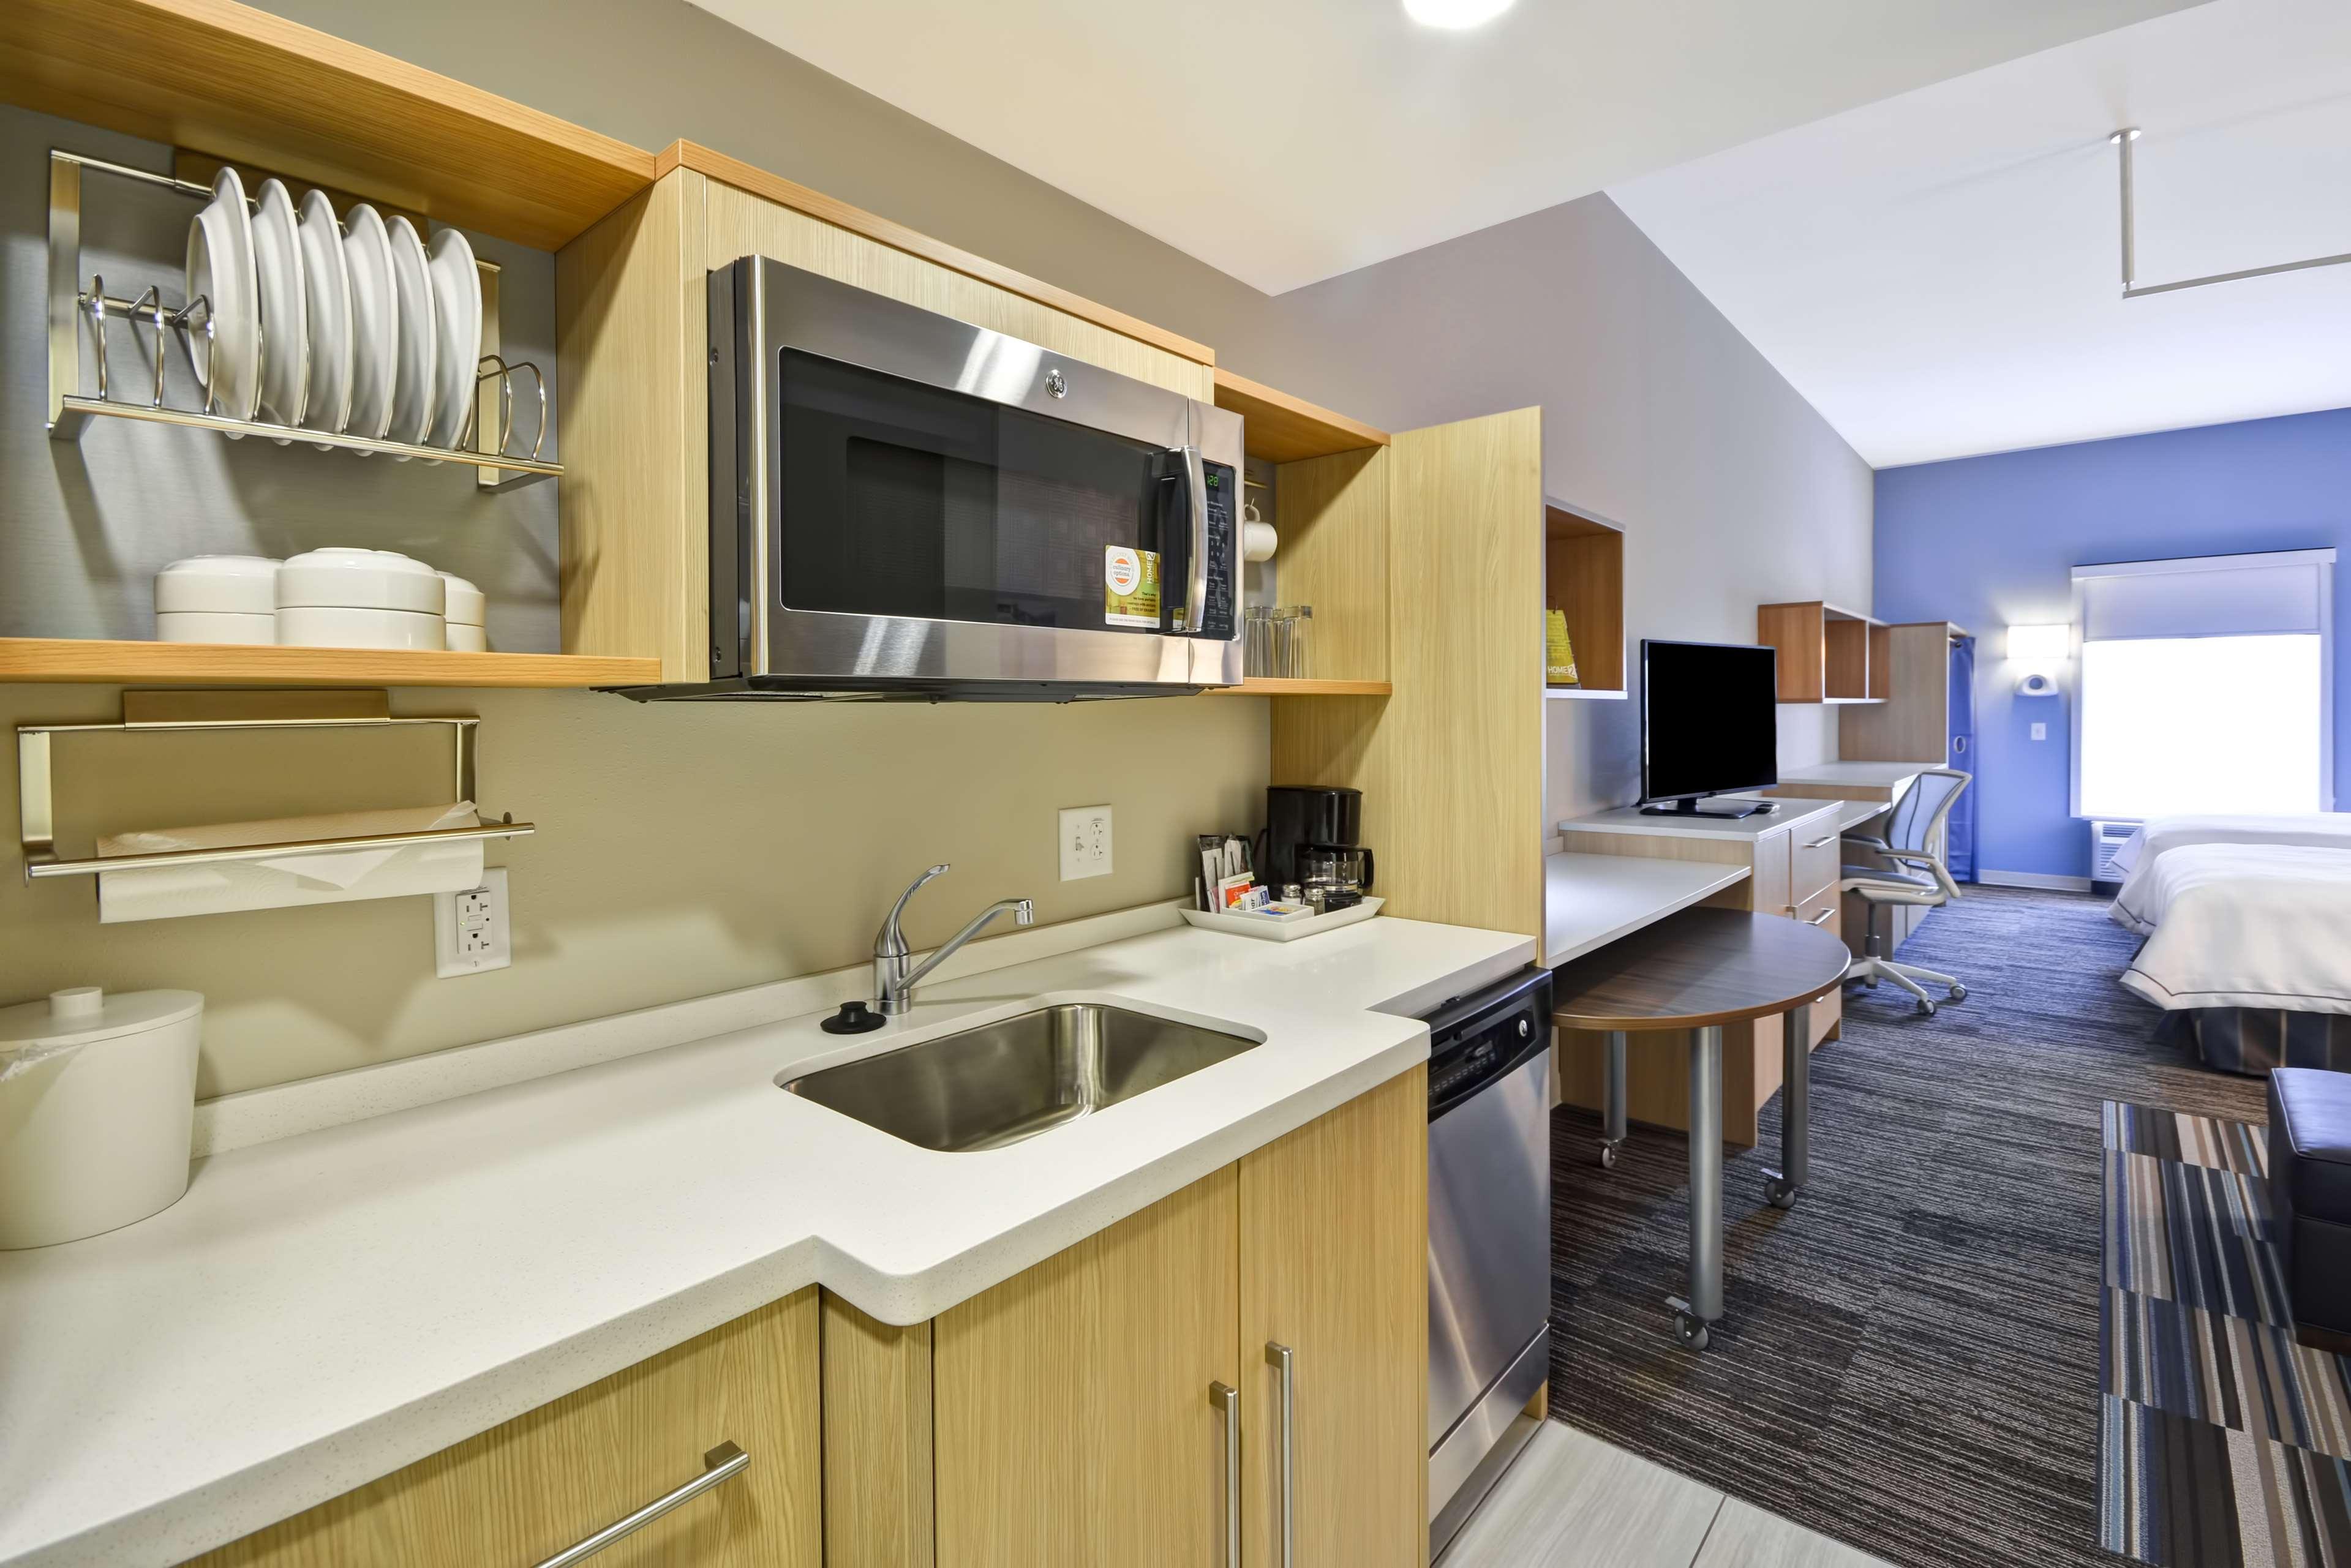 Home2 Suites by Hilton  St. Simons Island image 32